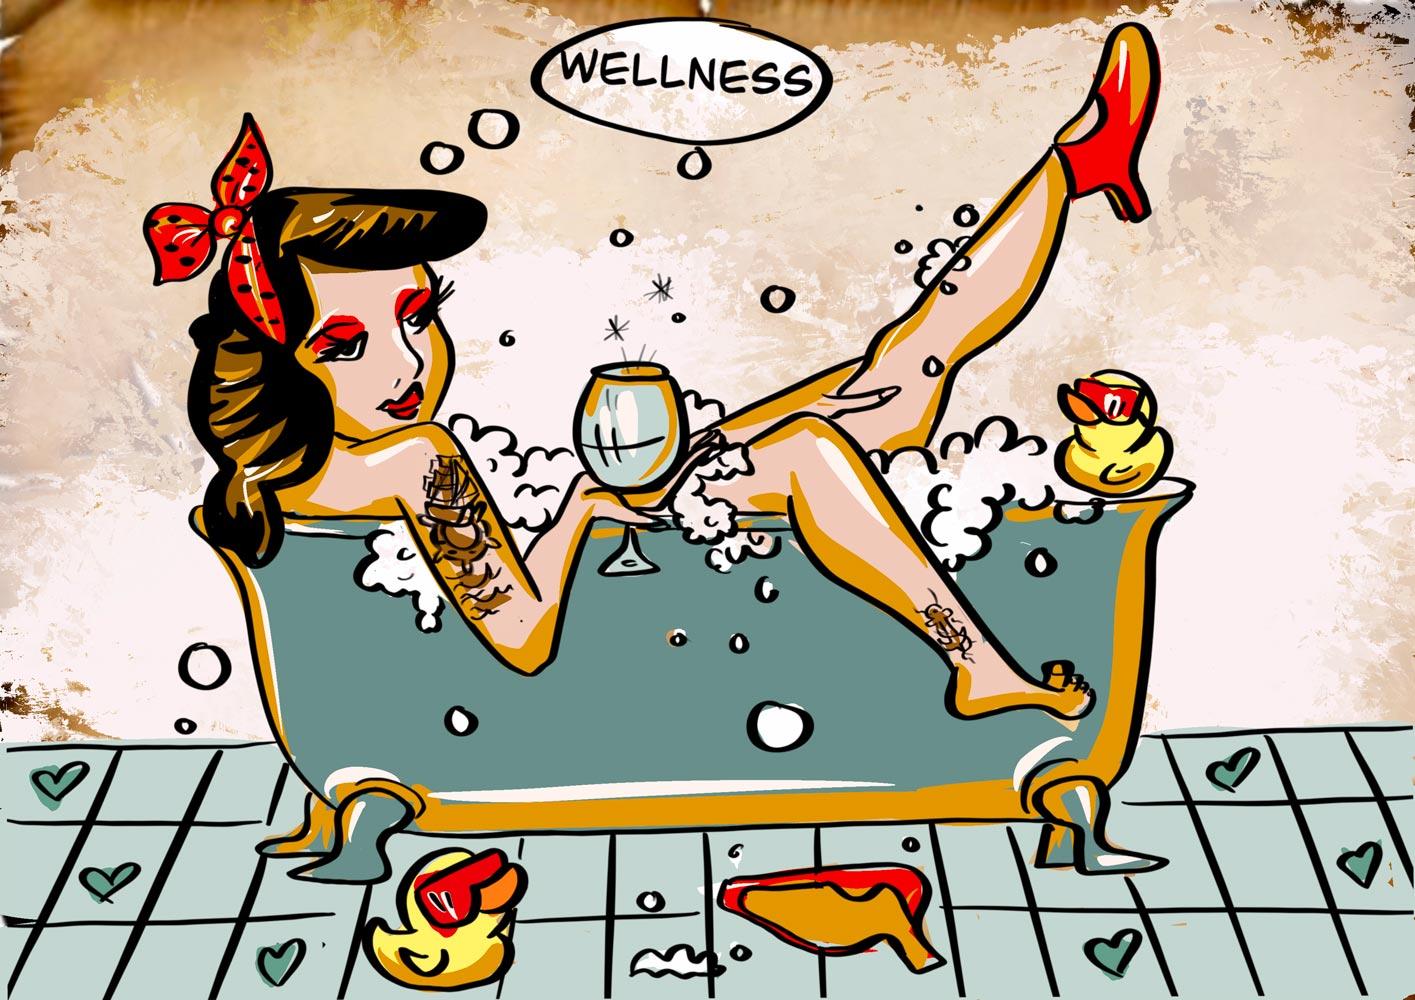 Academy Wellness